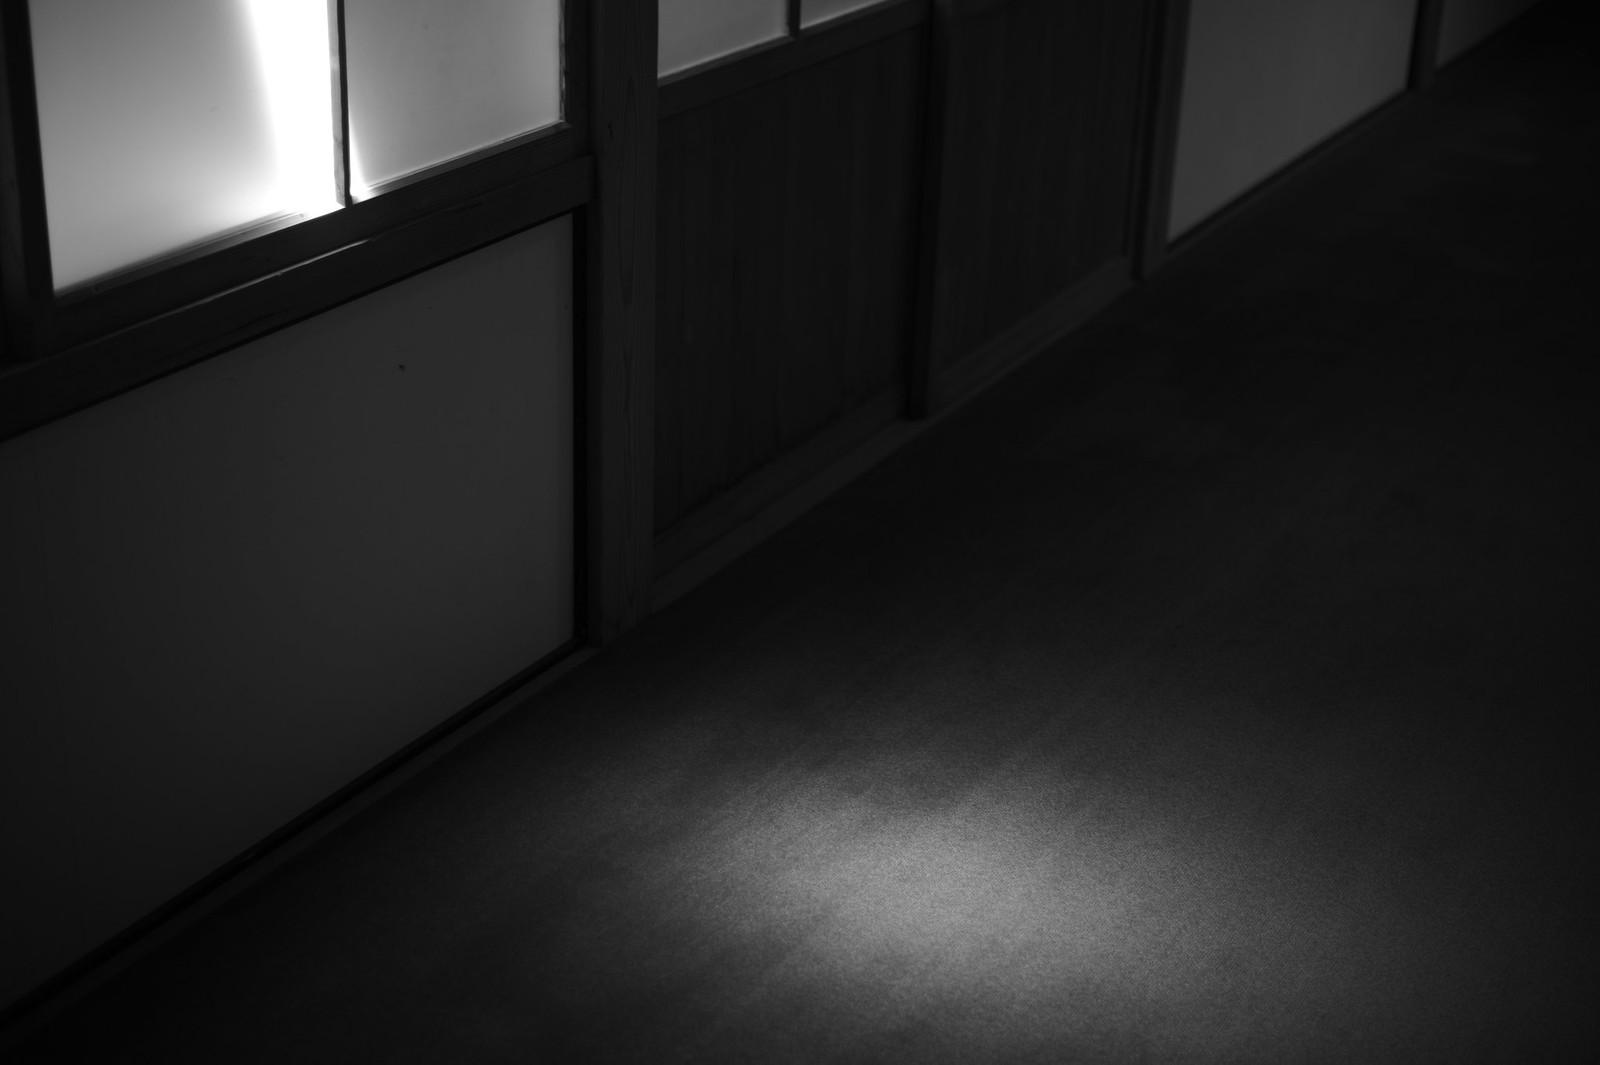 Oblique light